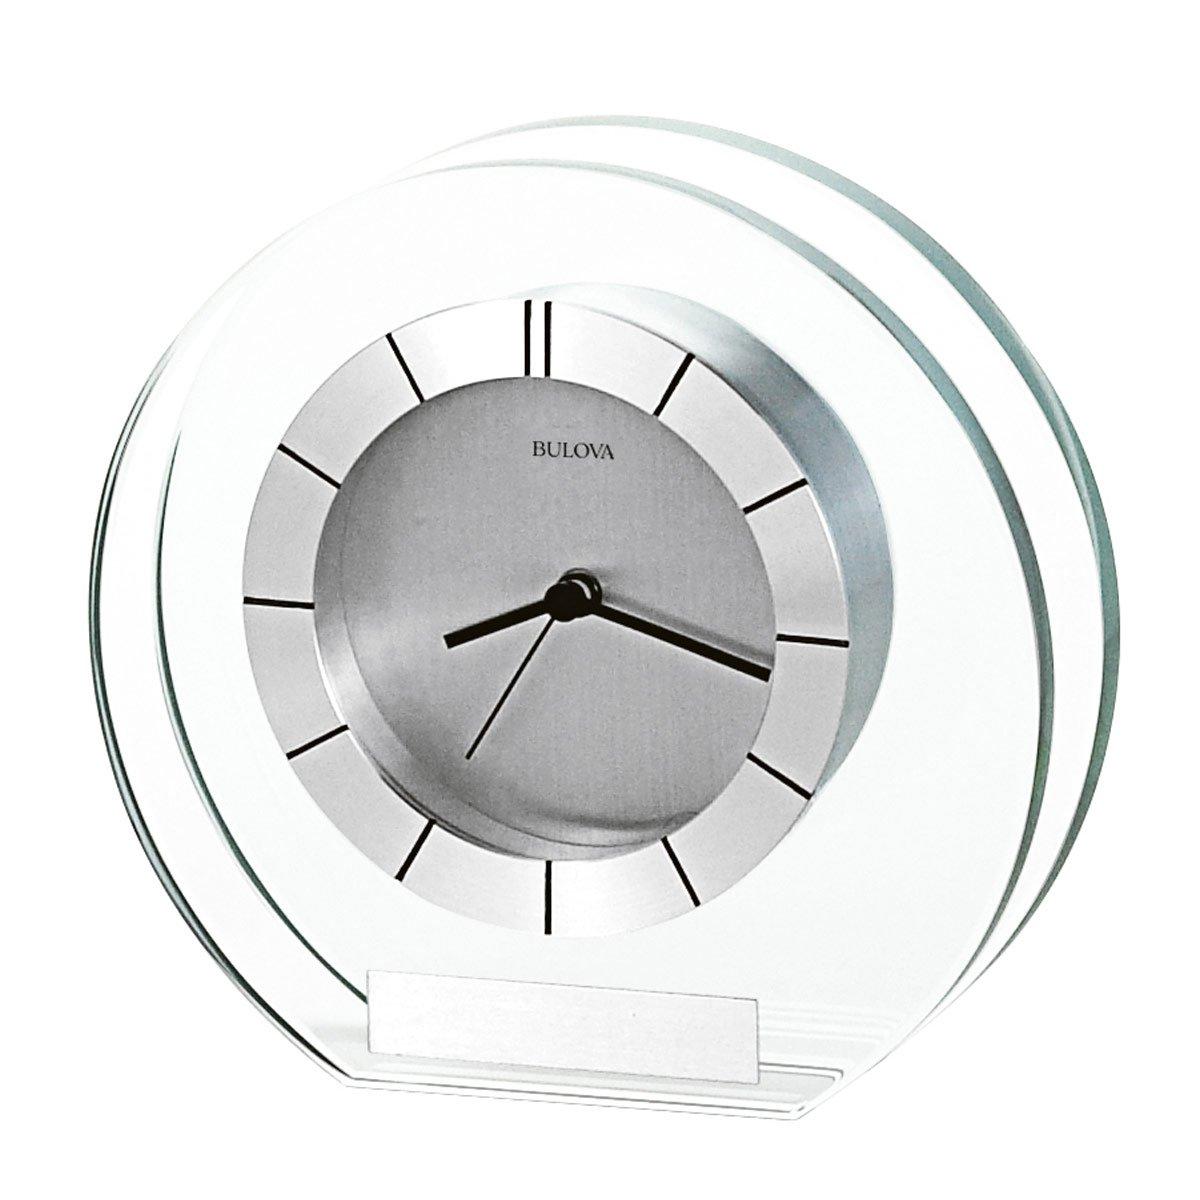 Bulova B2842 Mantle Clock Bulova Canada